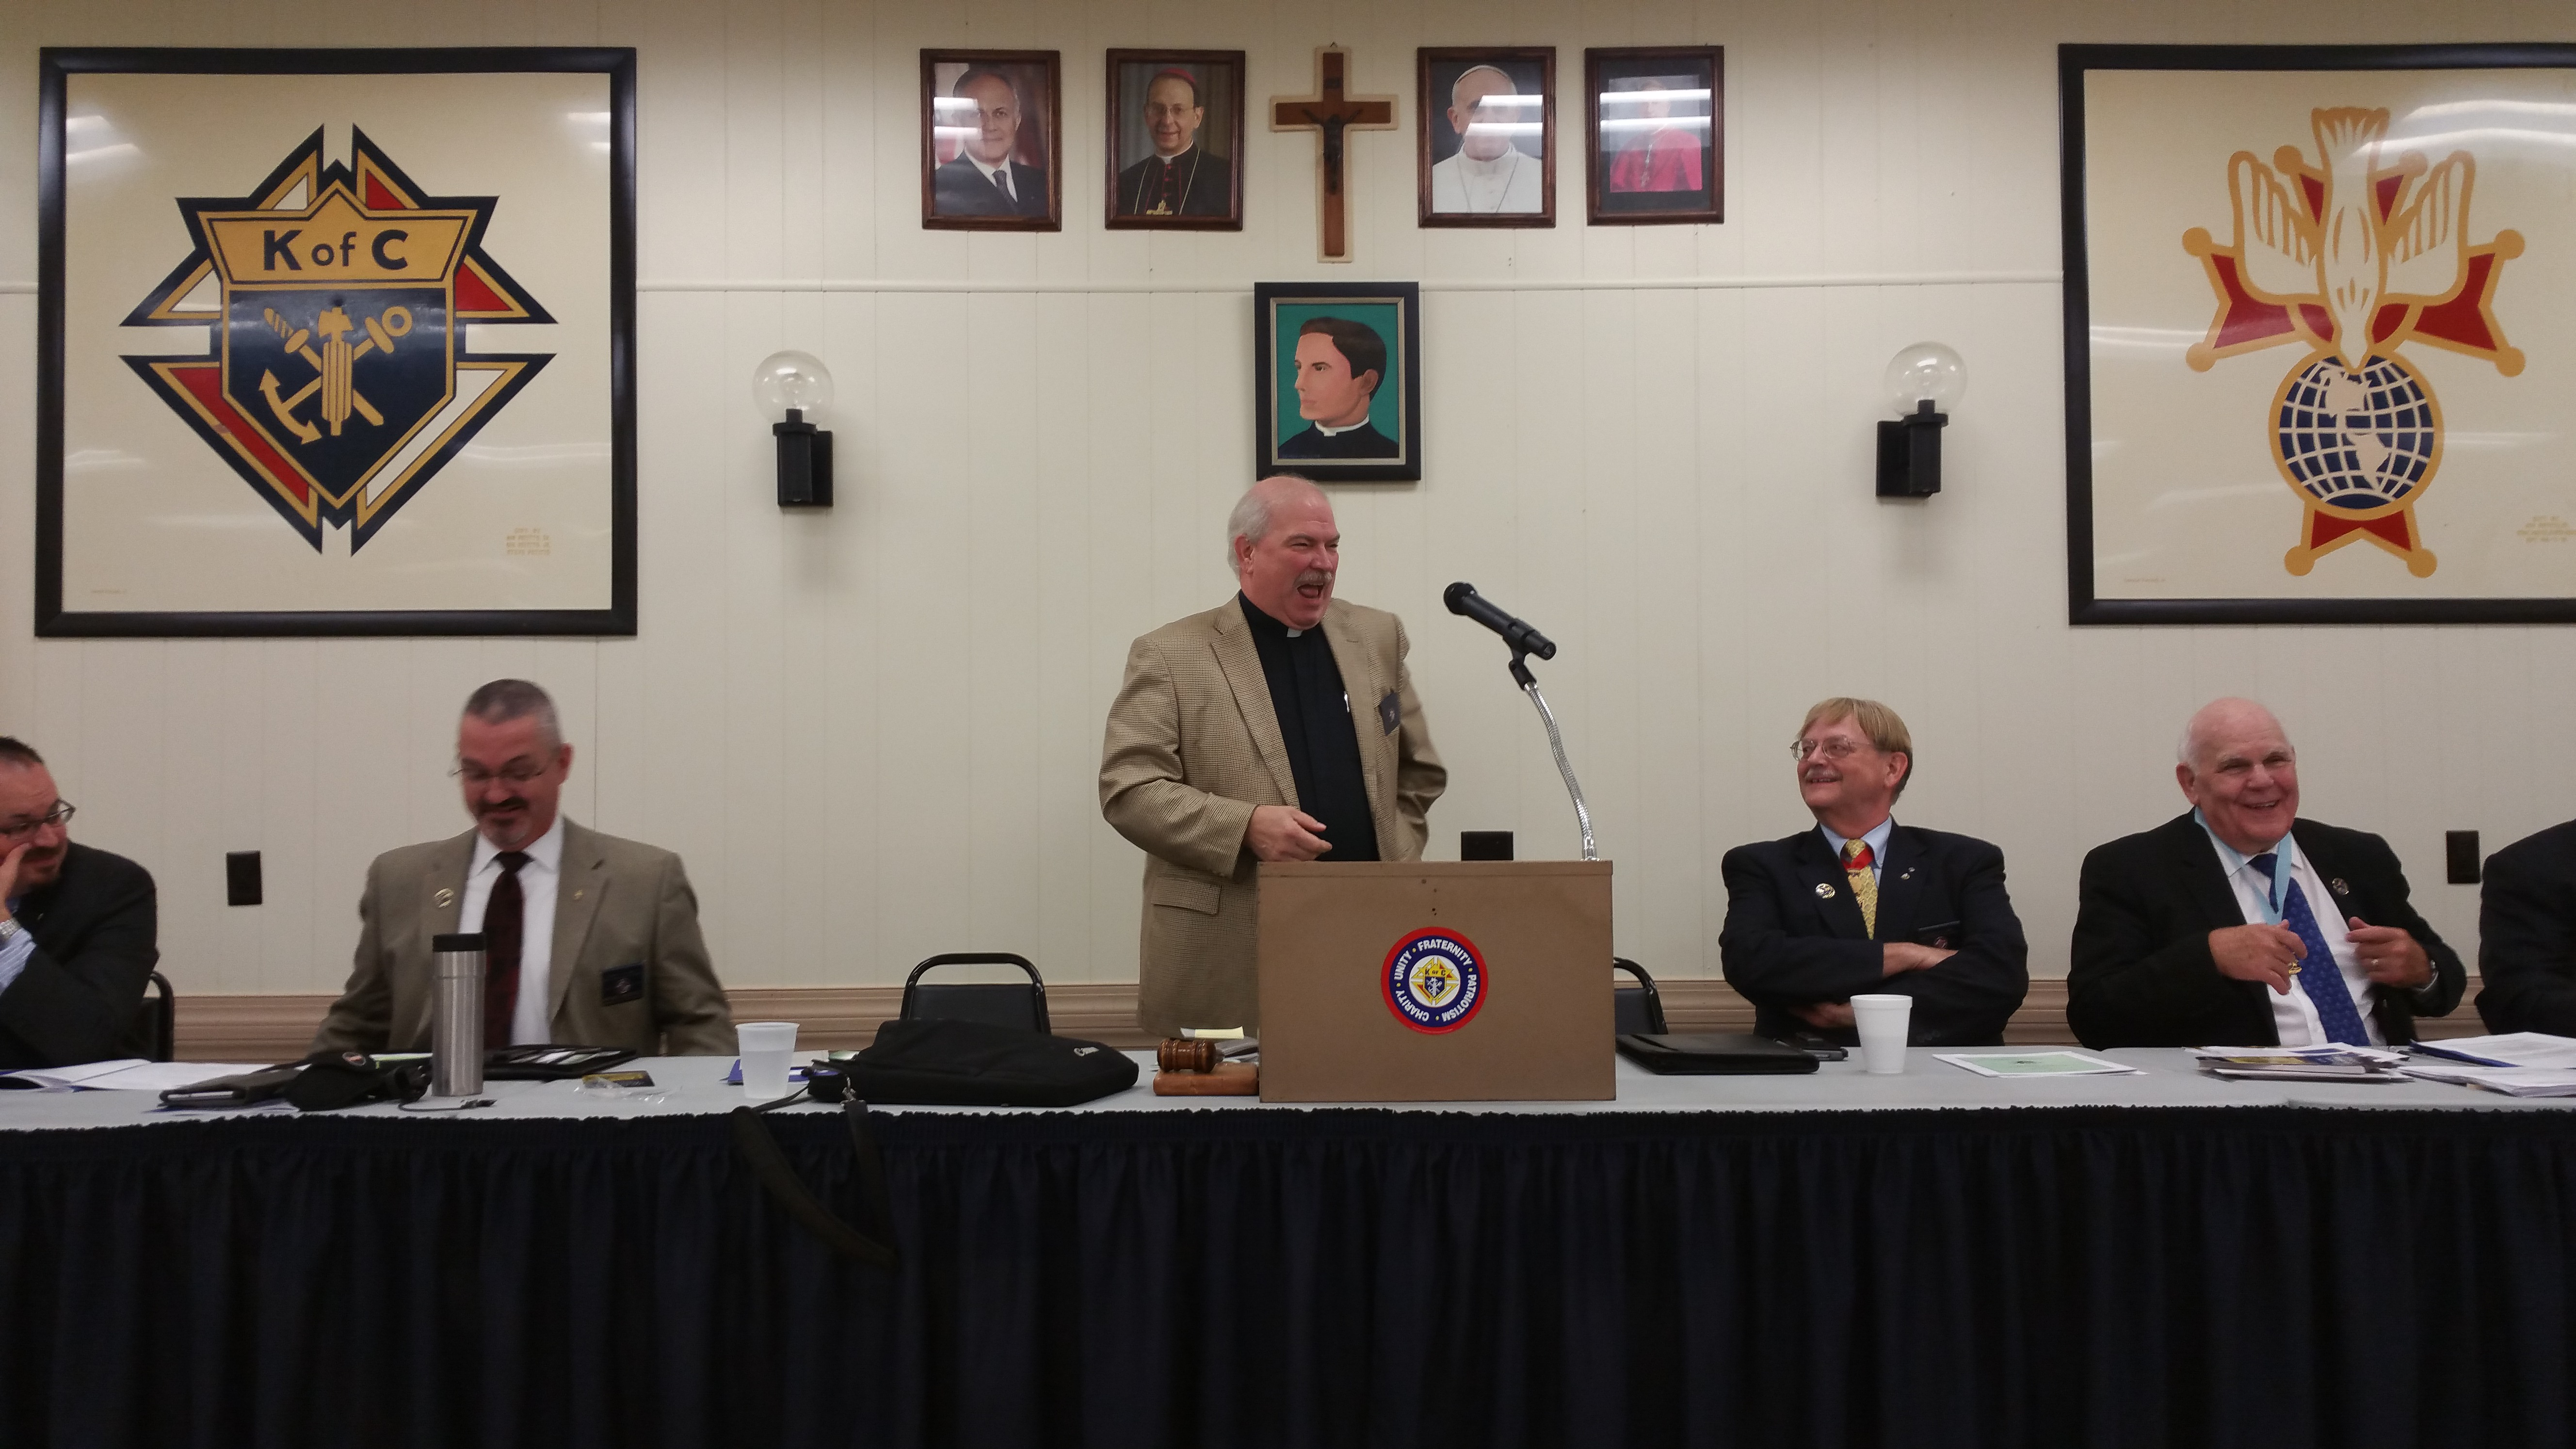 Rev. John Rice-STATE CHAPLAIN